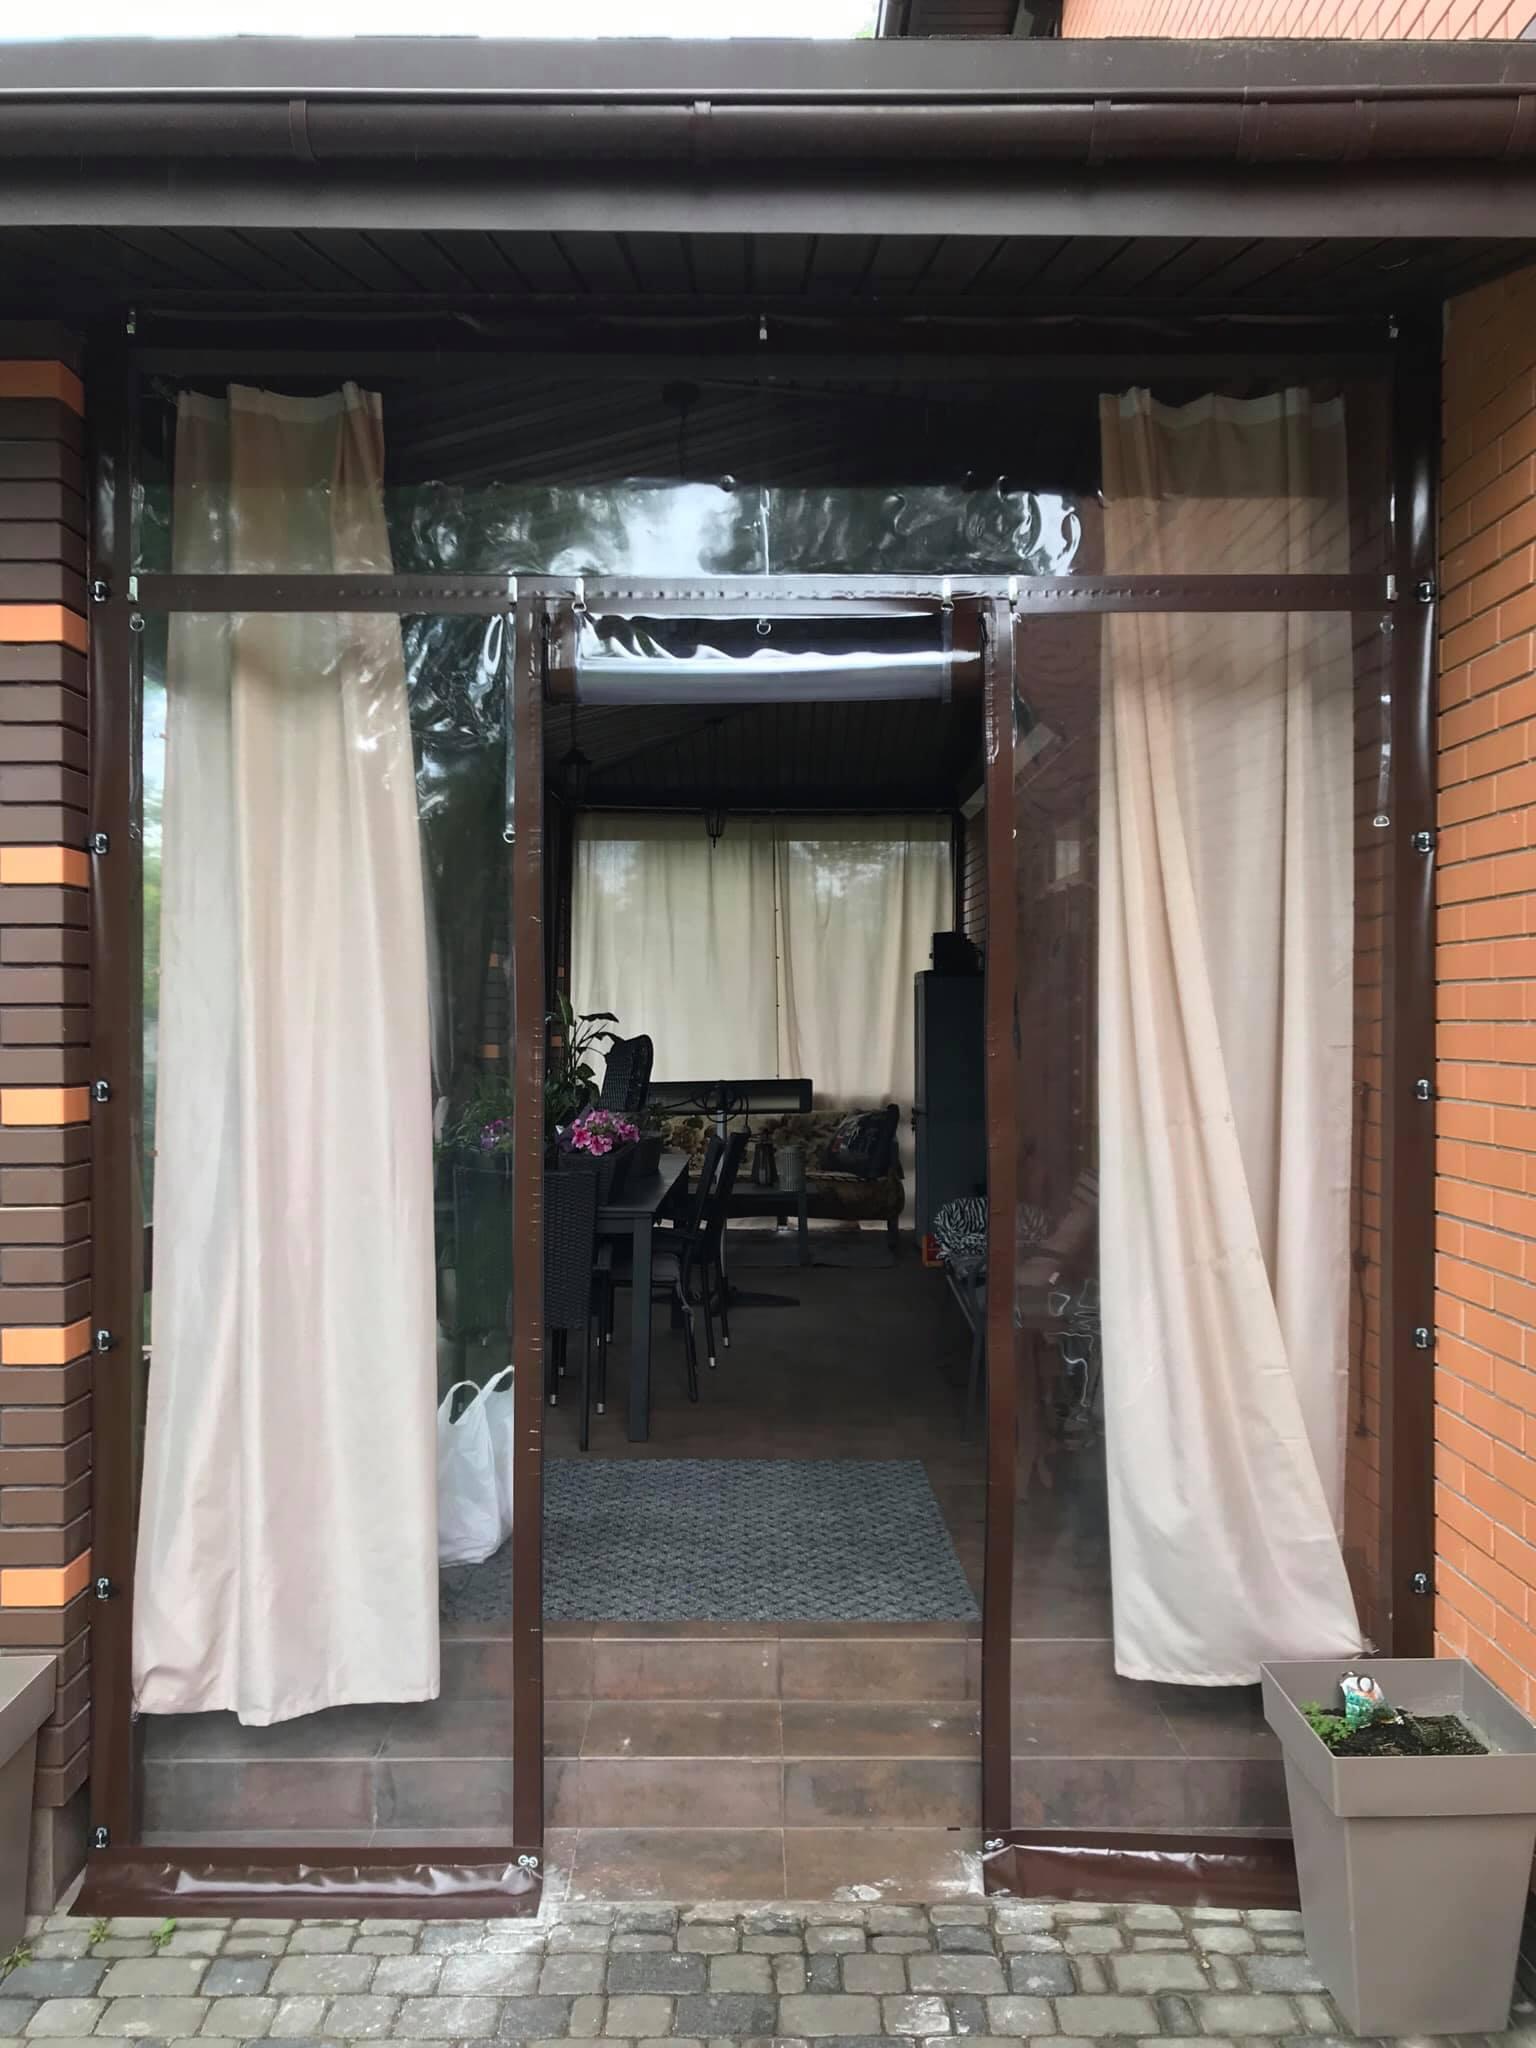 Гибкие двериа на кирпичную веранду в Киеве (Славутич дачи)